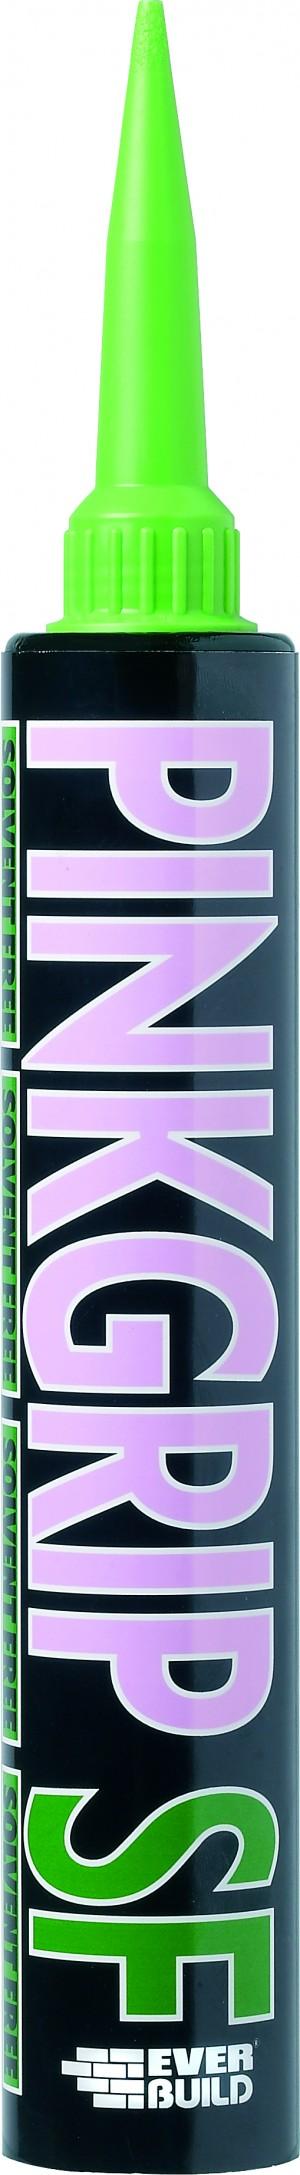 SikaEverbuild Pinkgrip Solvent Free 380ml [EVPINKSF]